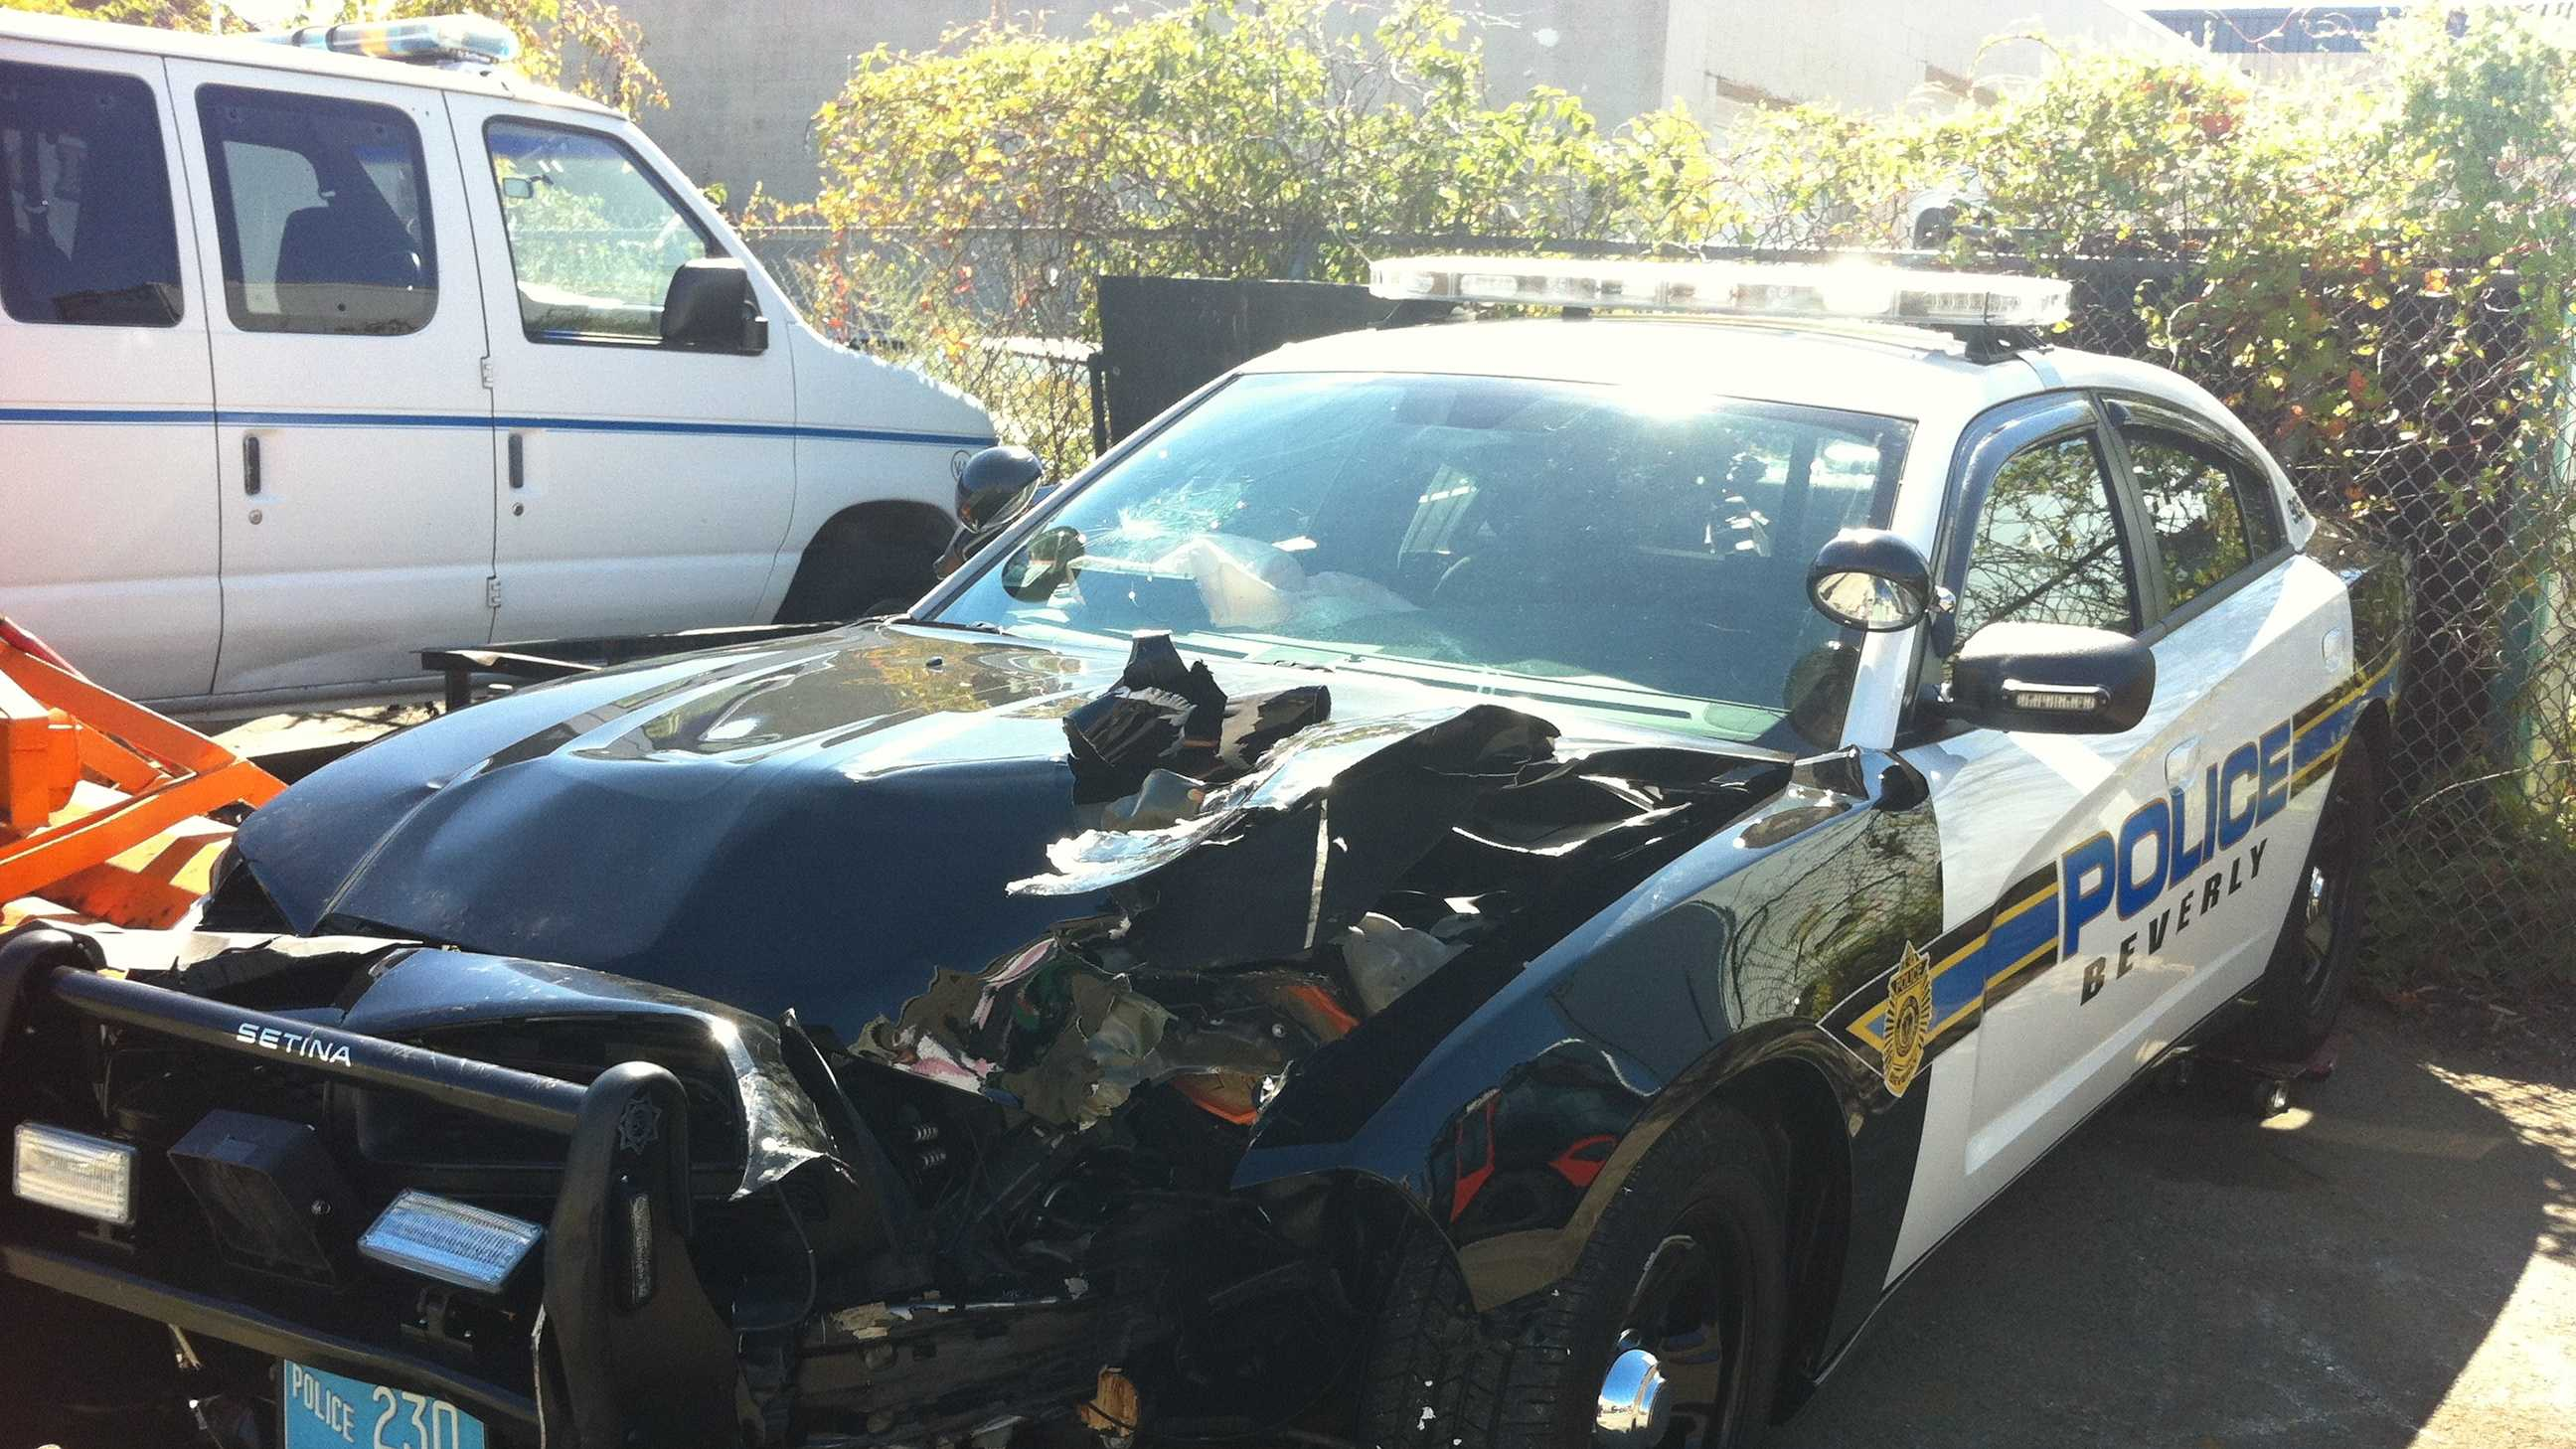 Beverly cruiser crash